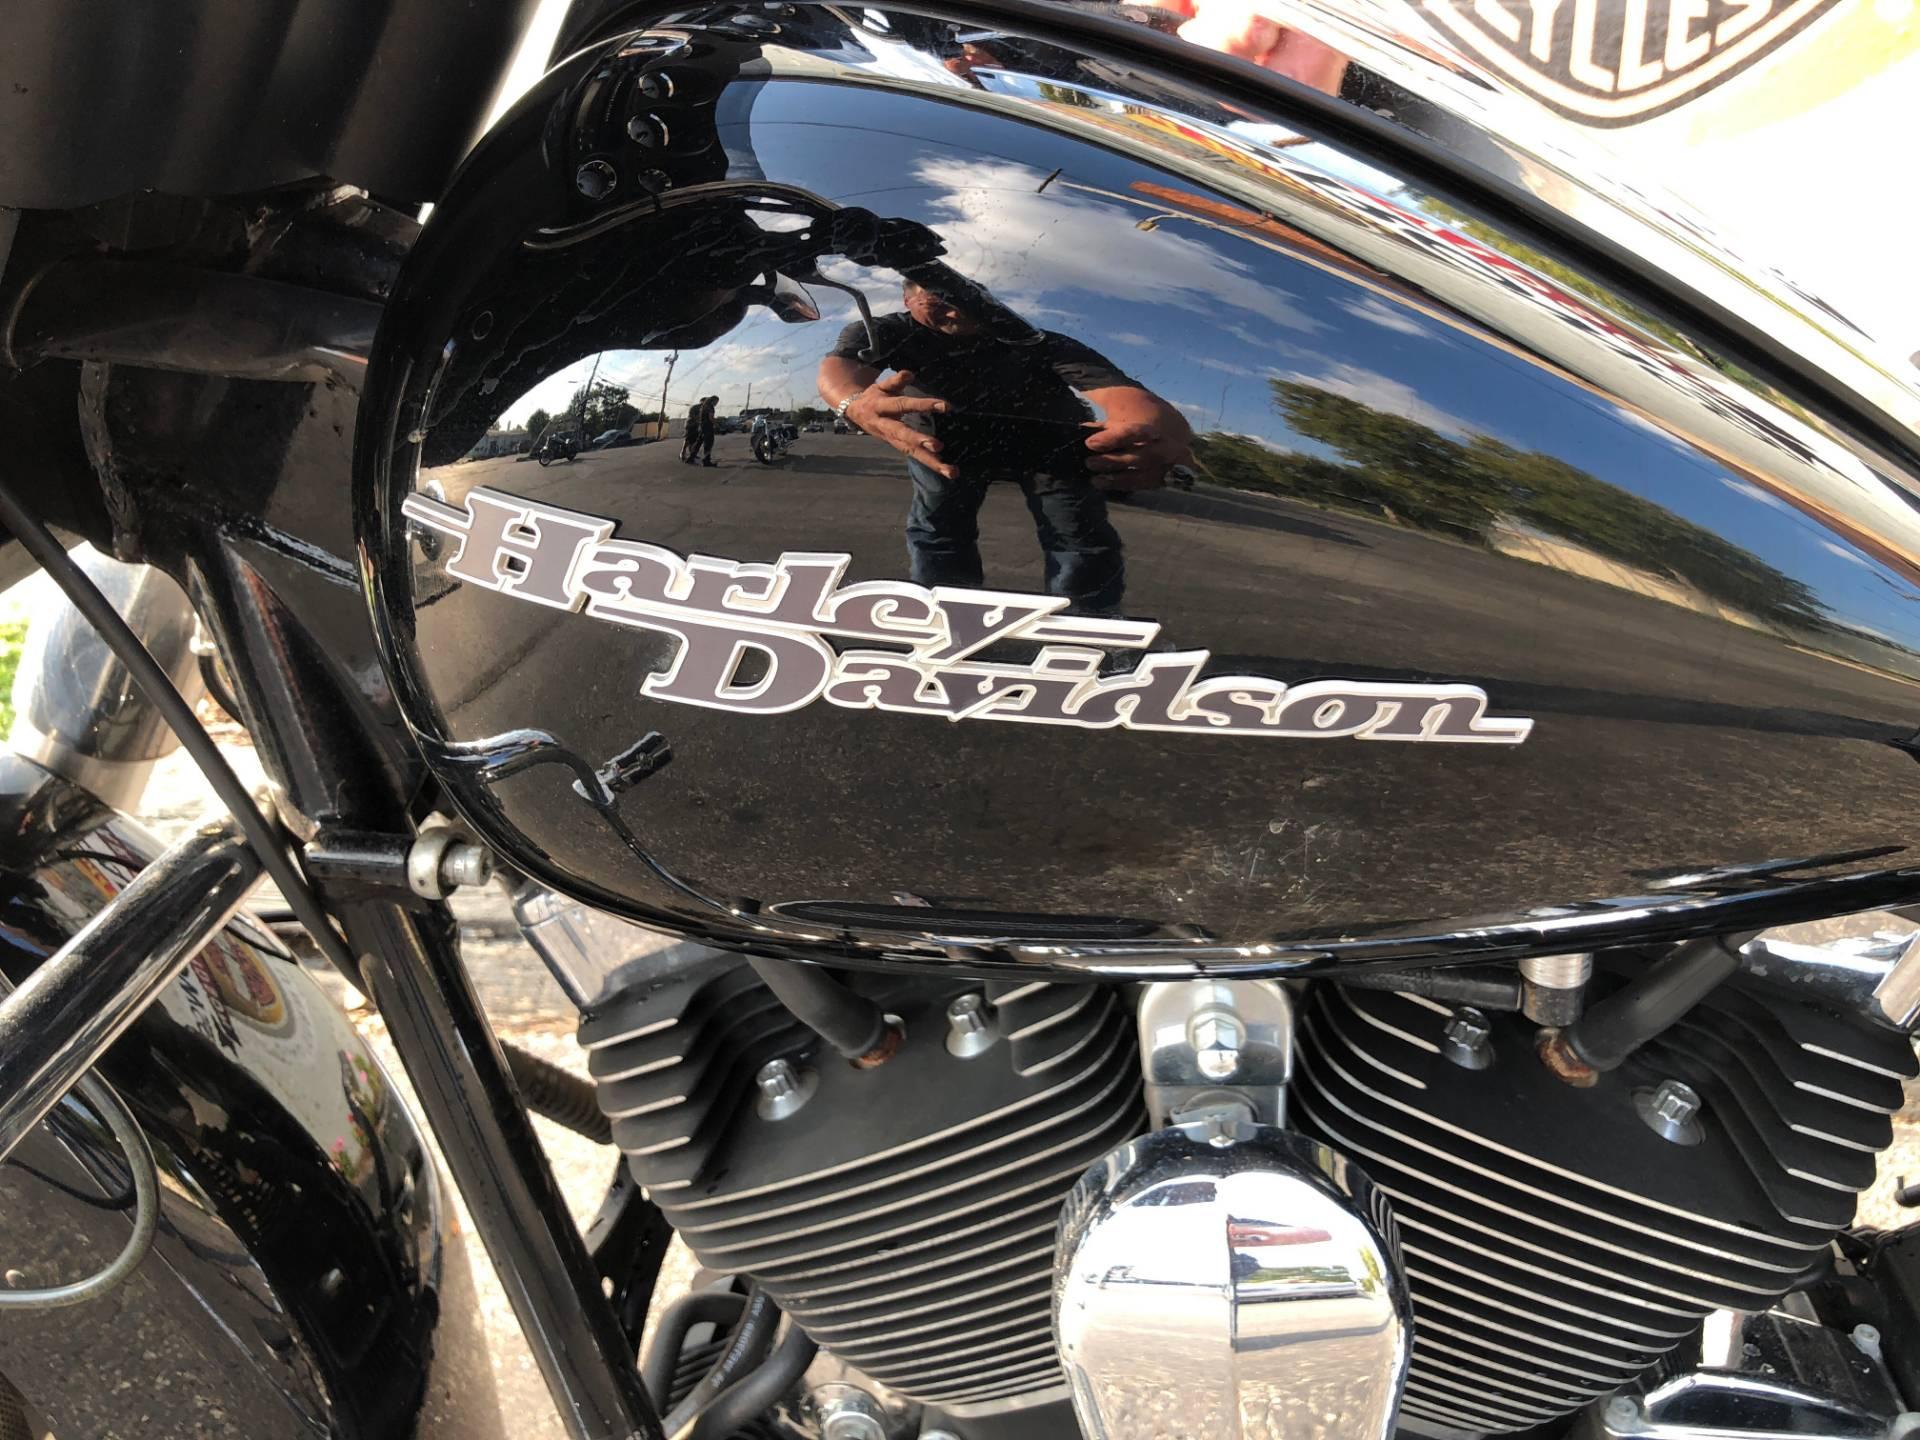 2012 Harley Davidson Street Glide Motorcycles Sunbury Ohio In